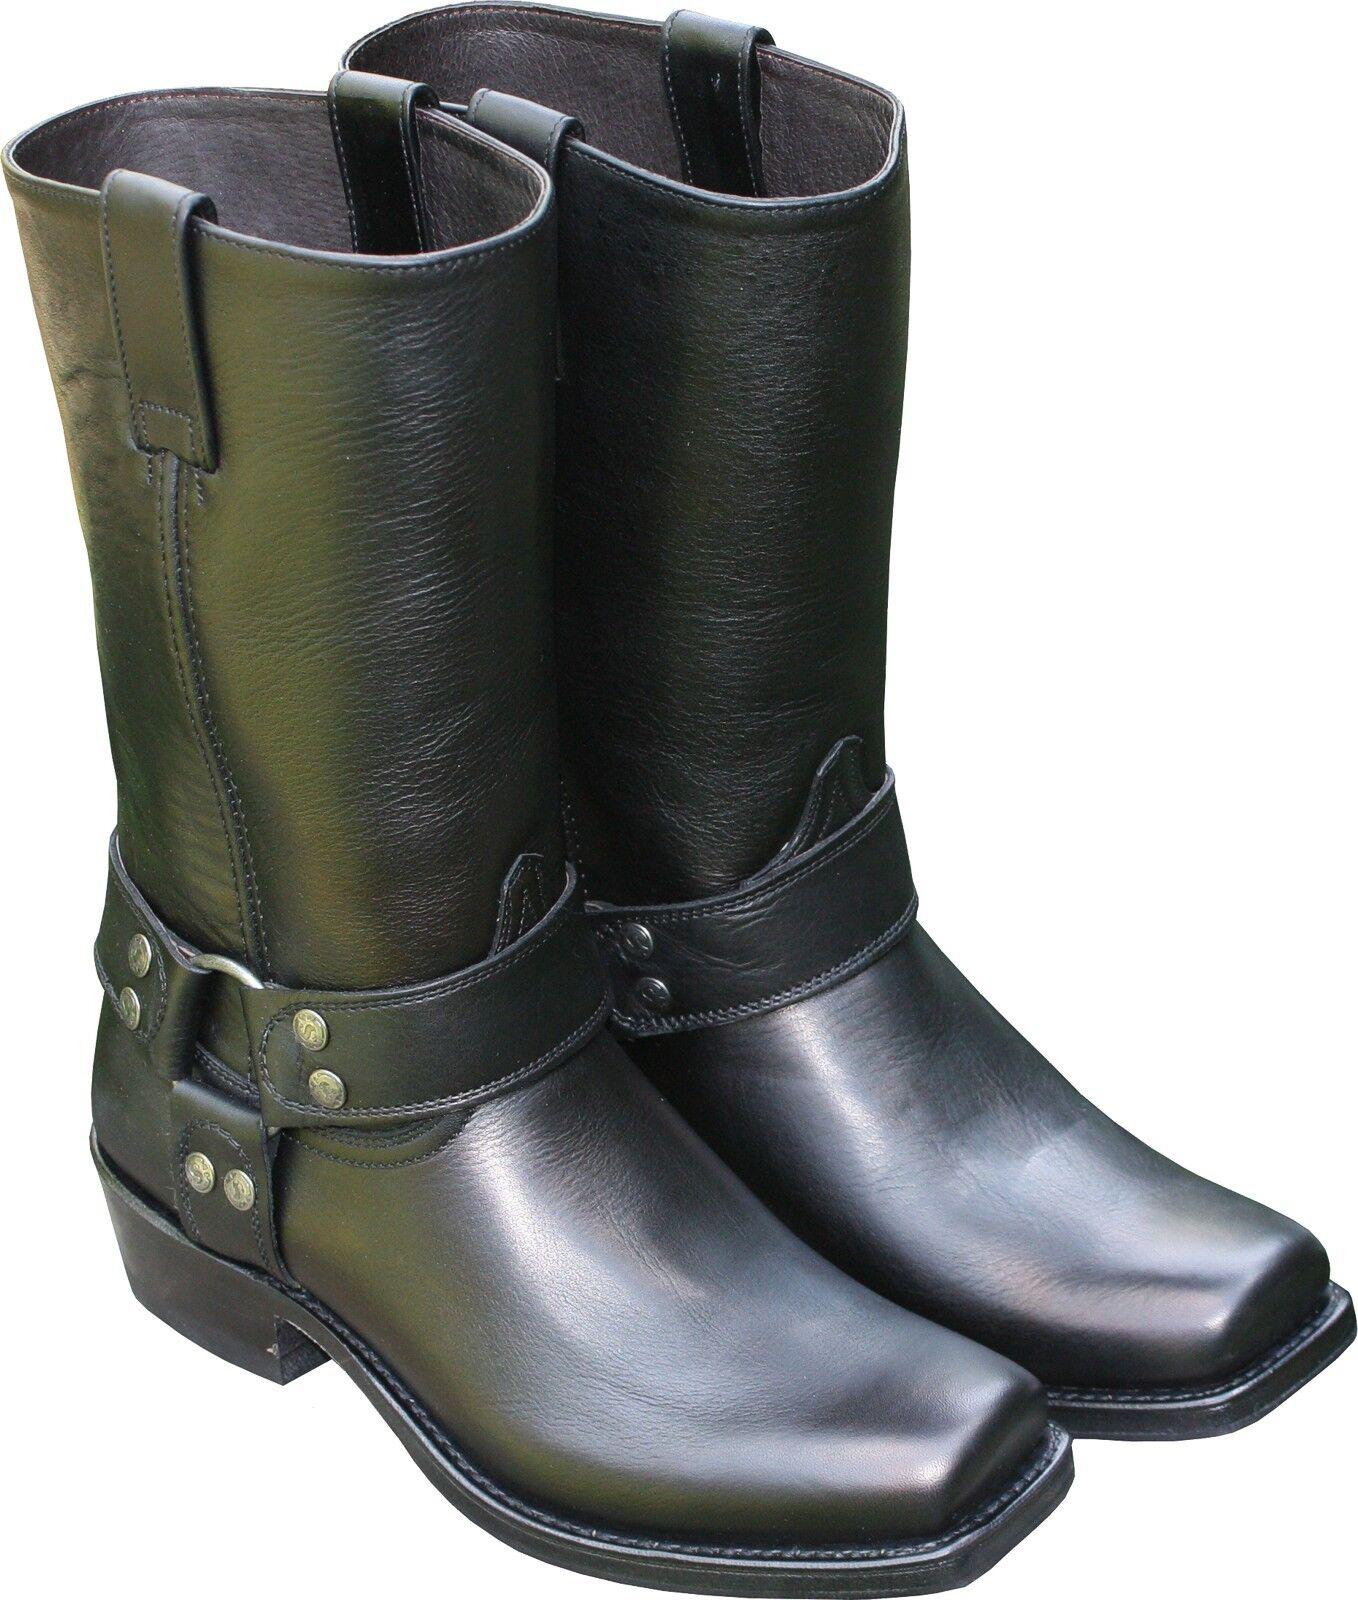 Sendra Stivali PELLE NERA BIKER-Stivali Cowboy Country Western Stivali Moto